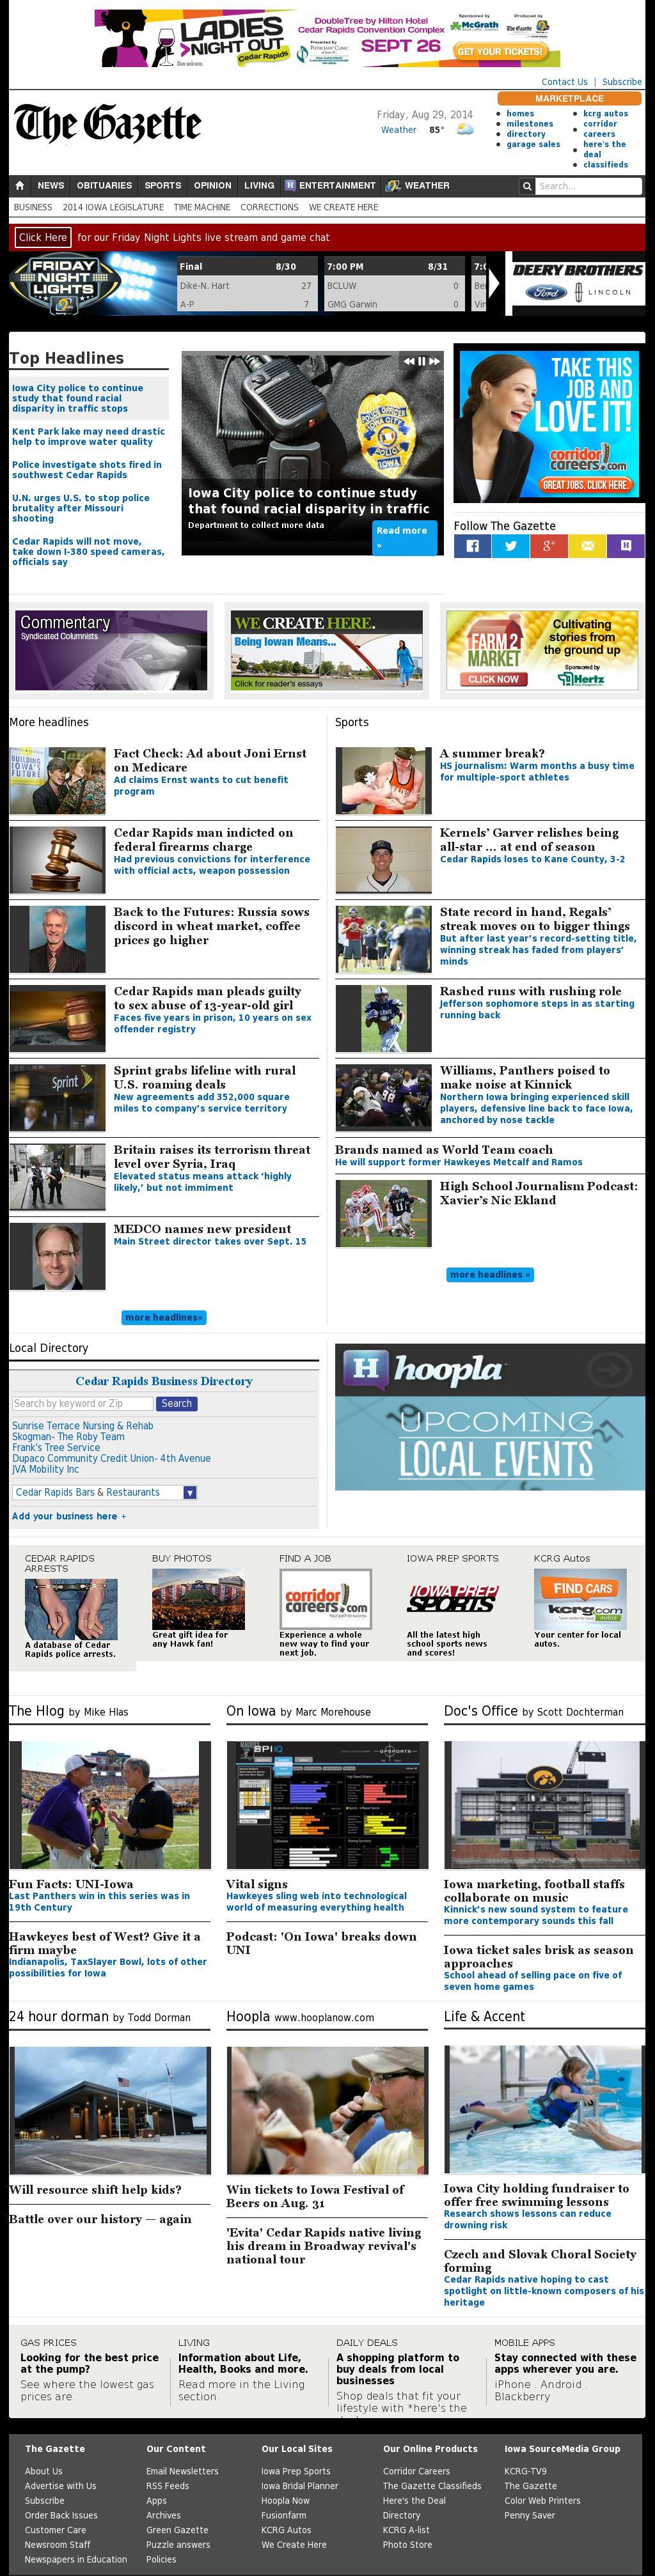 The (Cedar Rapids) Gazette at Friday Aug. 29, 2014, 10:05 p.m. UTC